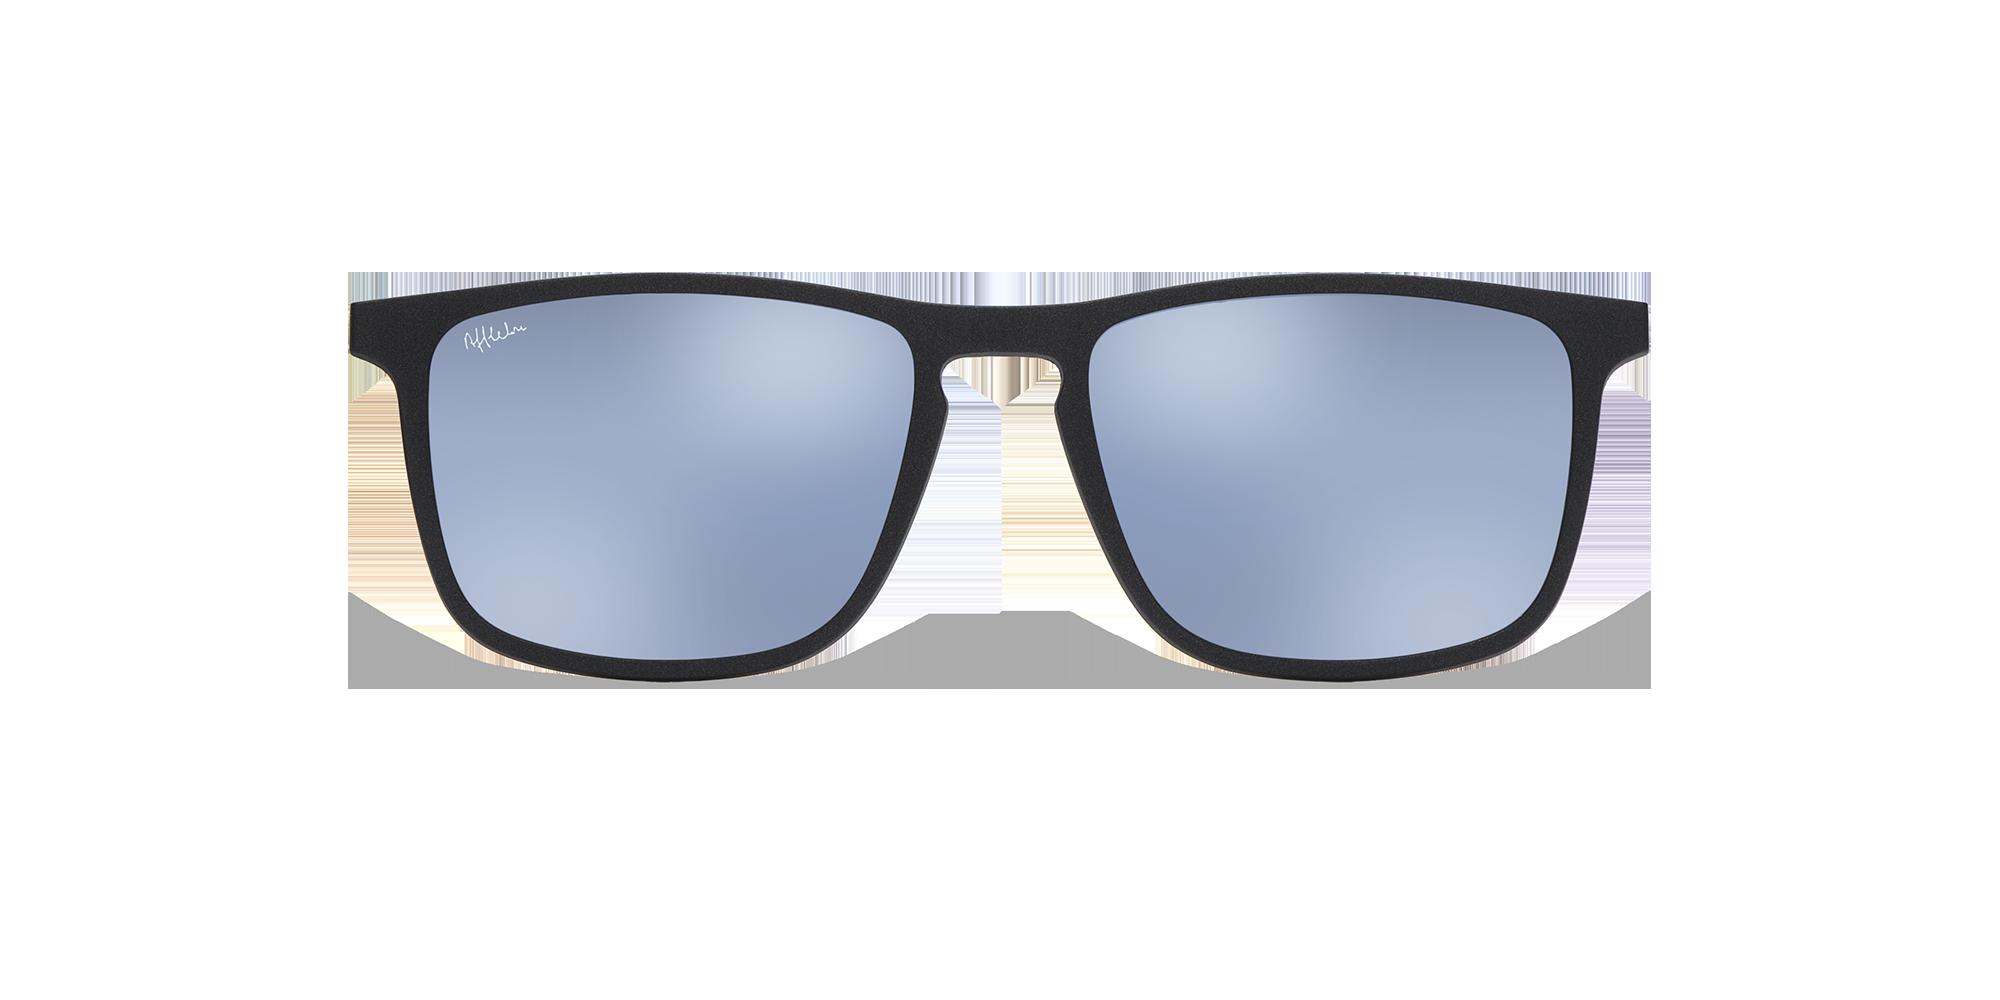 afflelou/france/products/smart_clip/clips_glasses/07630036428849_face.png